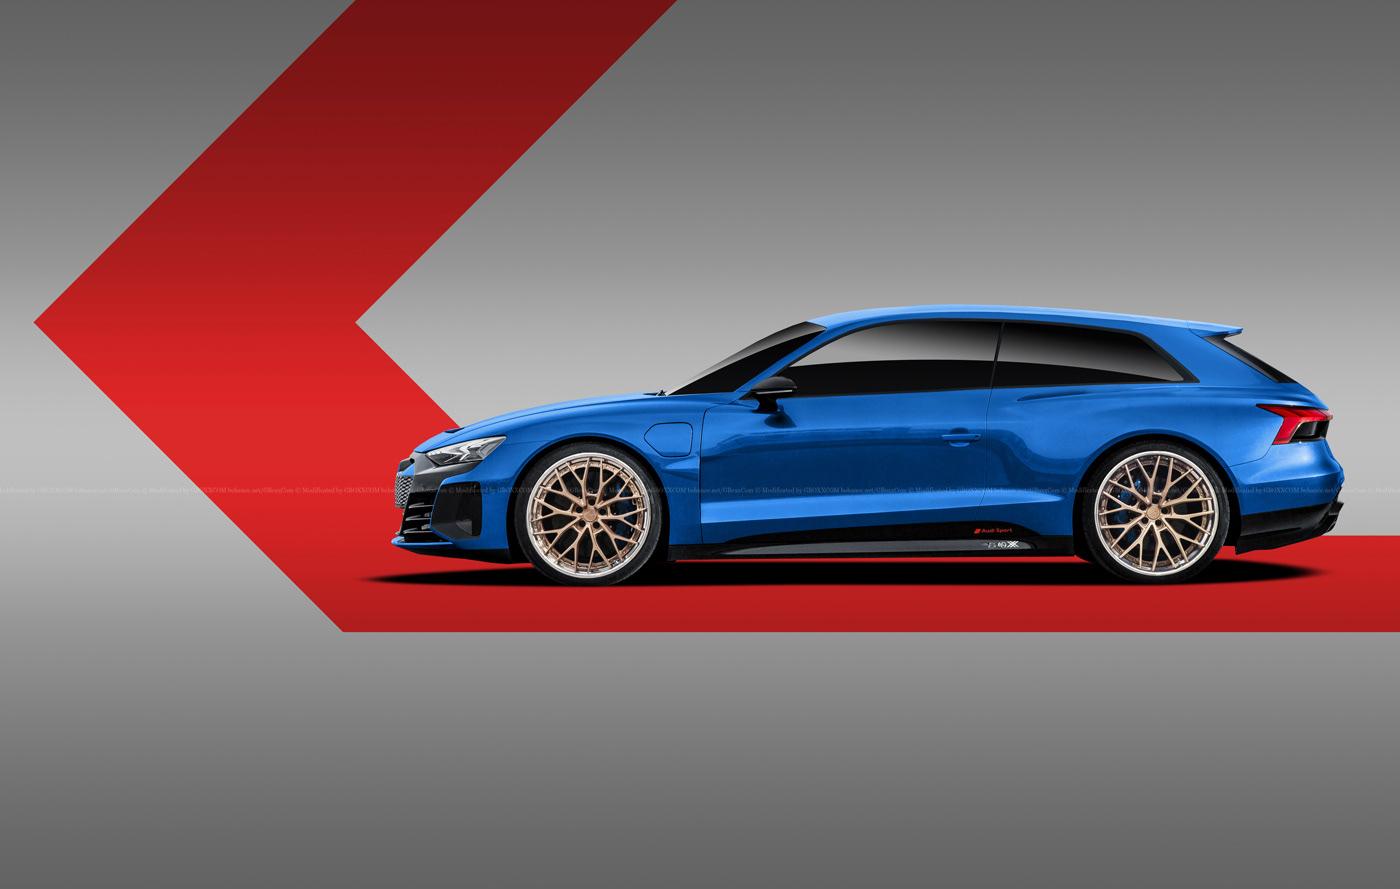 Audi E-Tron GT Spyder, E-Tron GT Wagon, E-Tron GT Coupe Renderings (8)